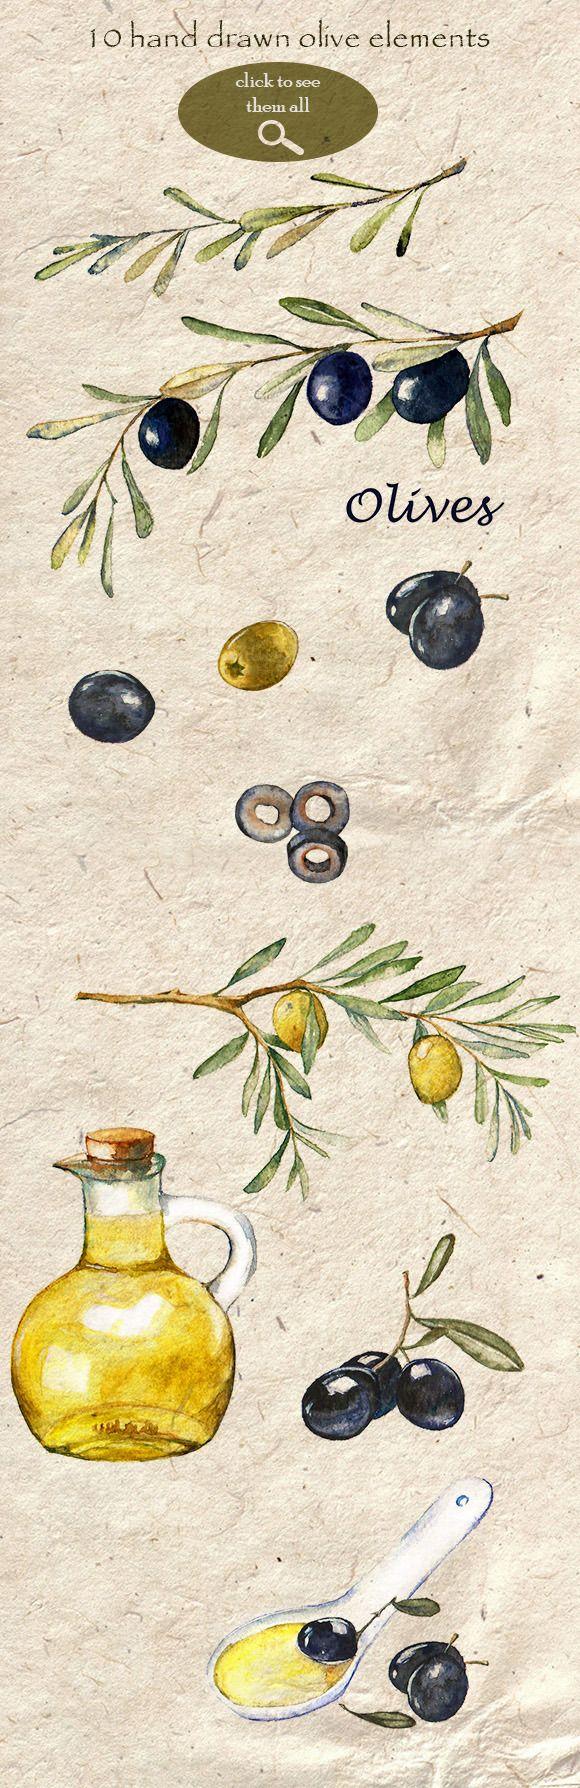 Watercolor Olive Set by Anastasia Nio on Creative Market